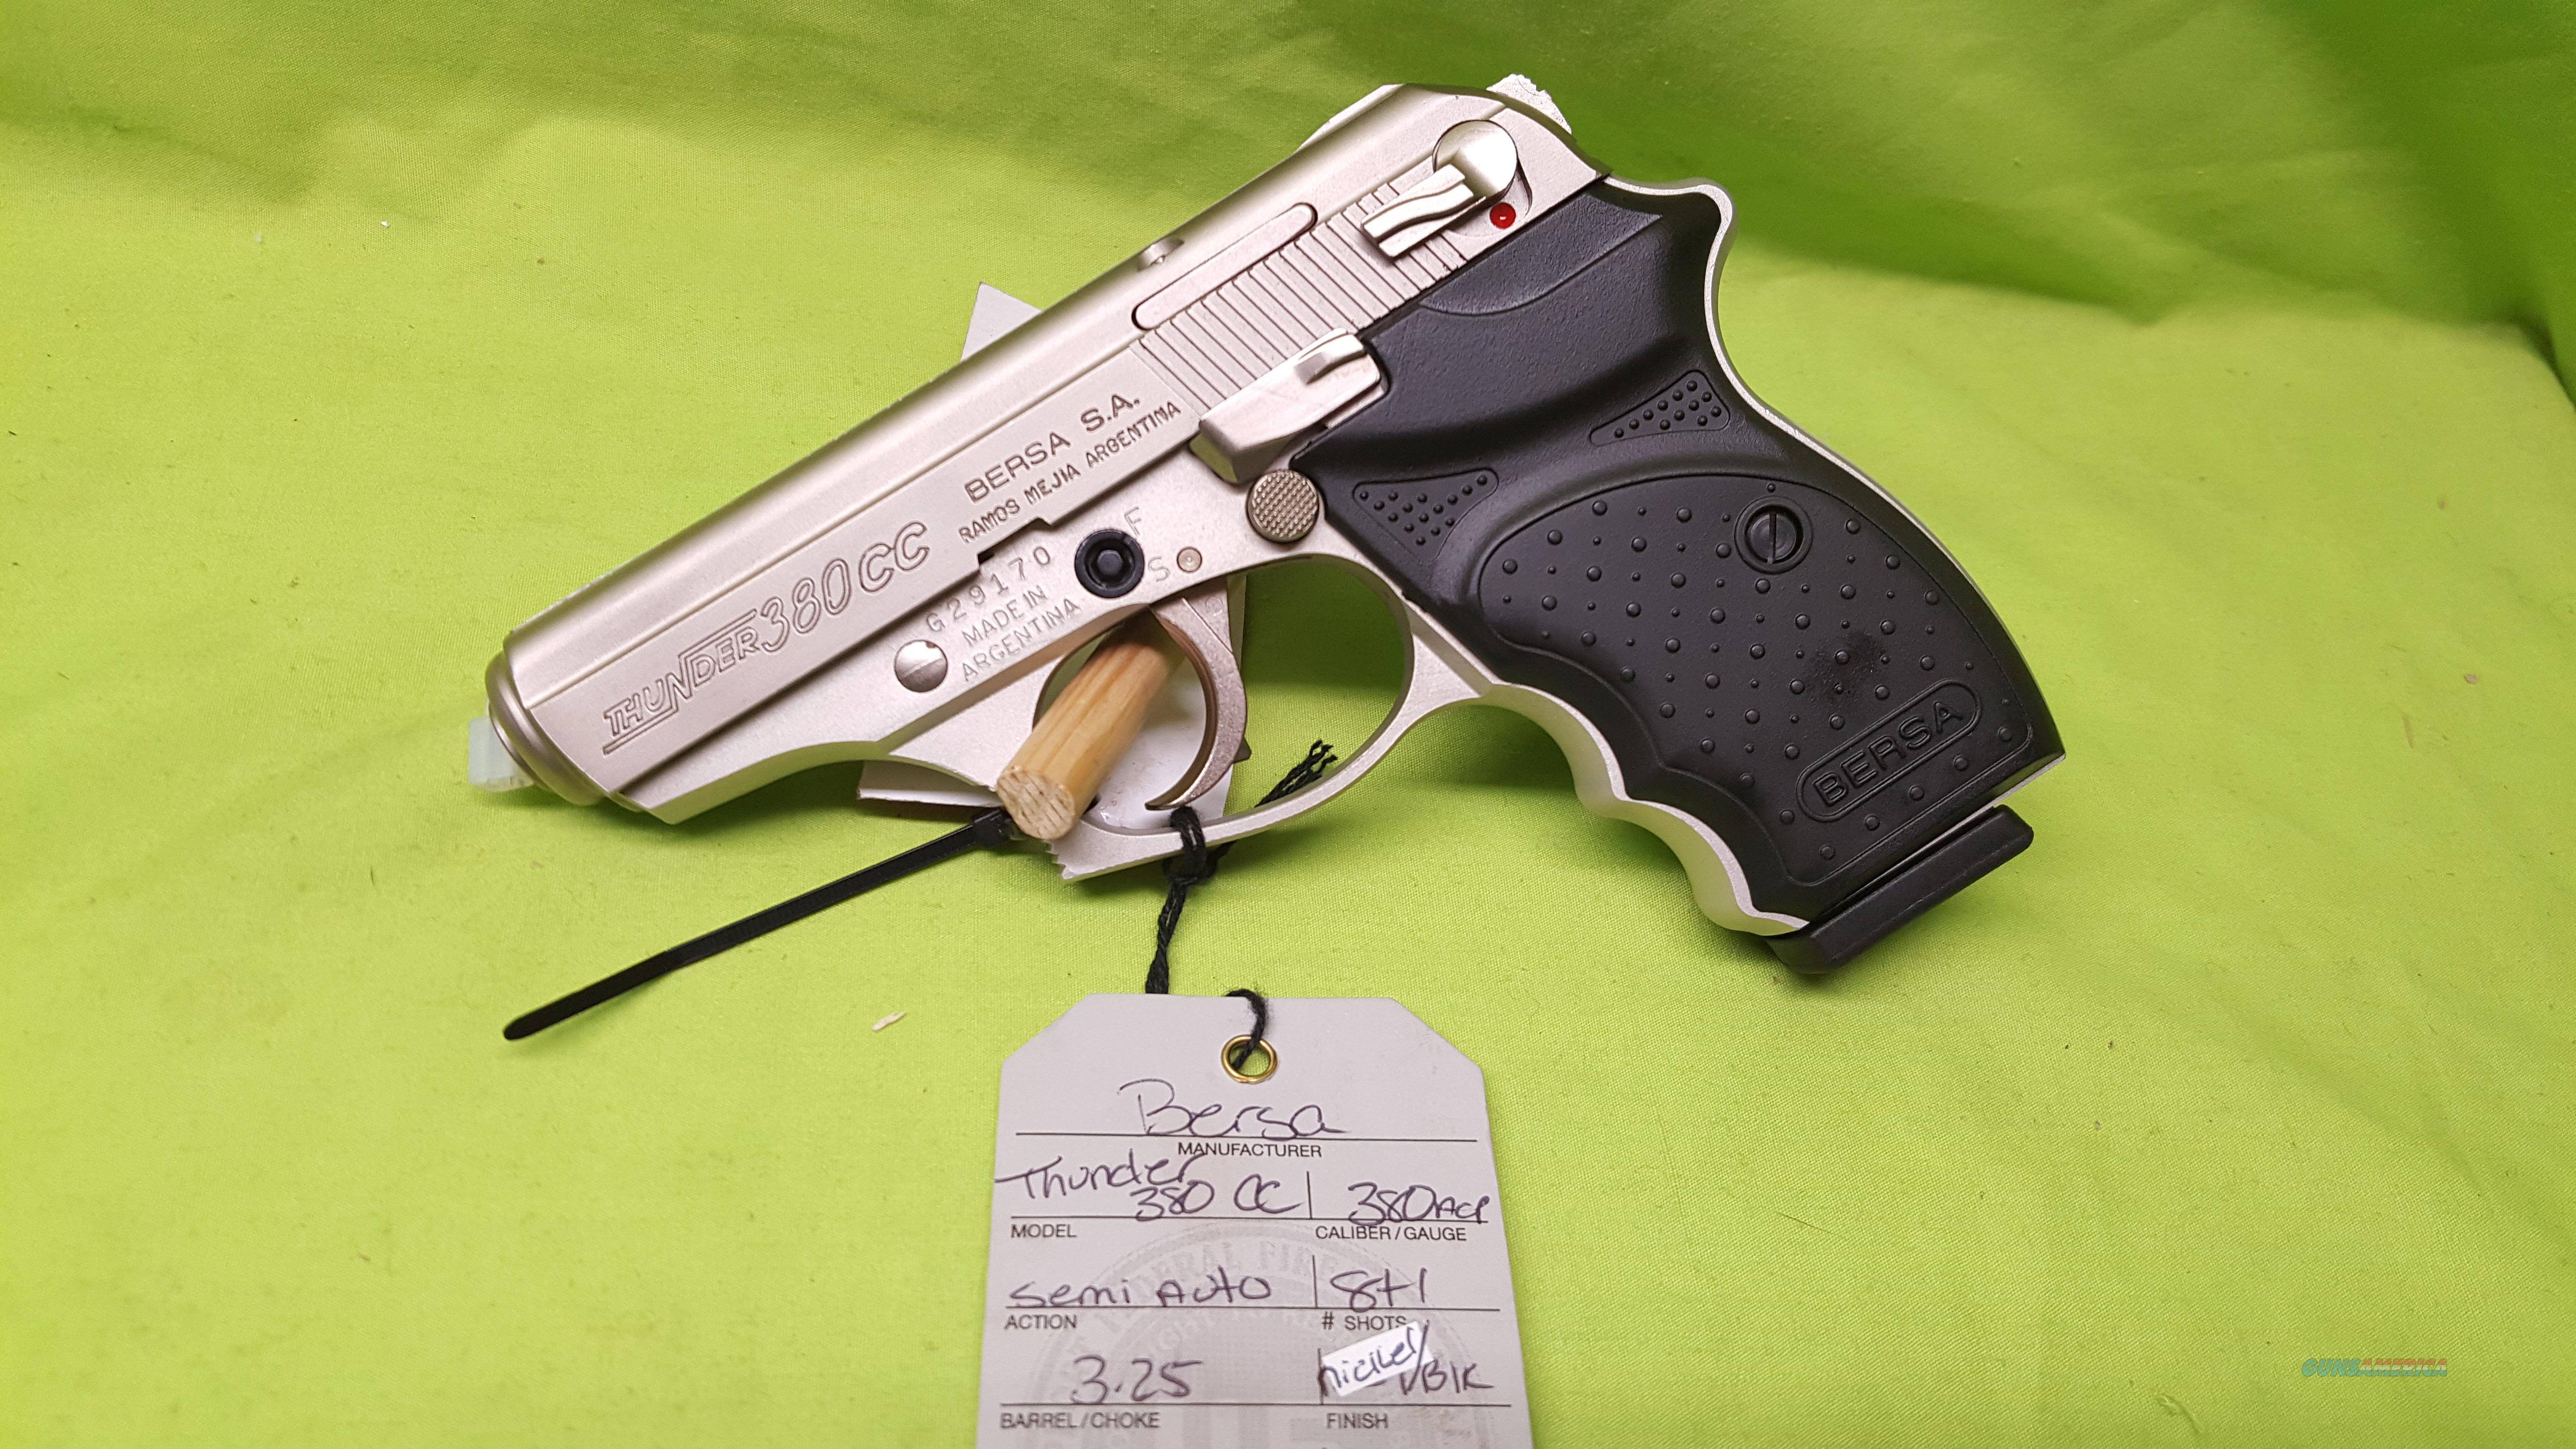 BERSA THUNDER 380 CC CONCEALED CARRY 380ACP 8 + 1   Guns > Pistols > Bersa Pistols